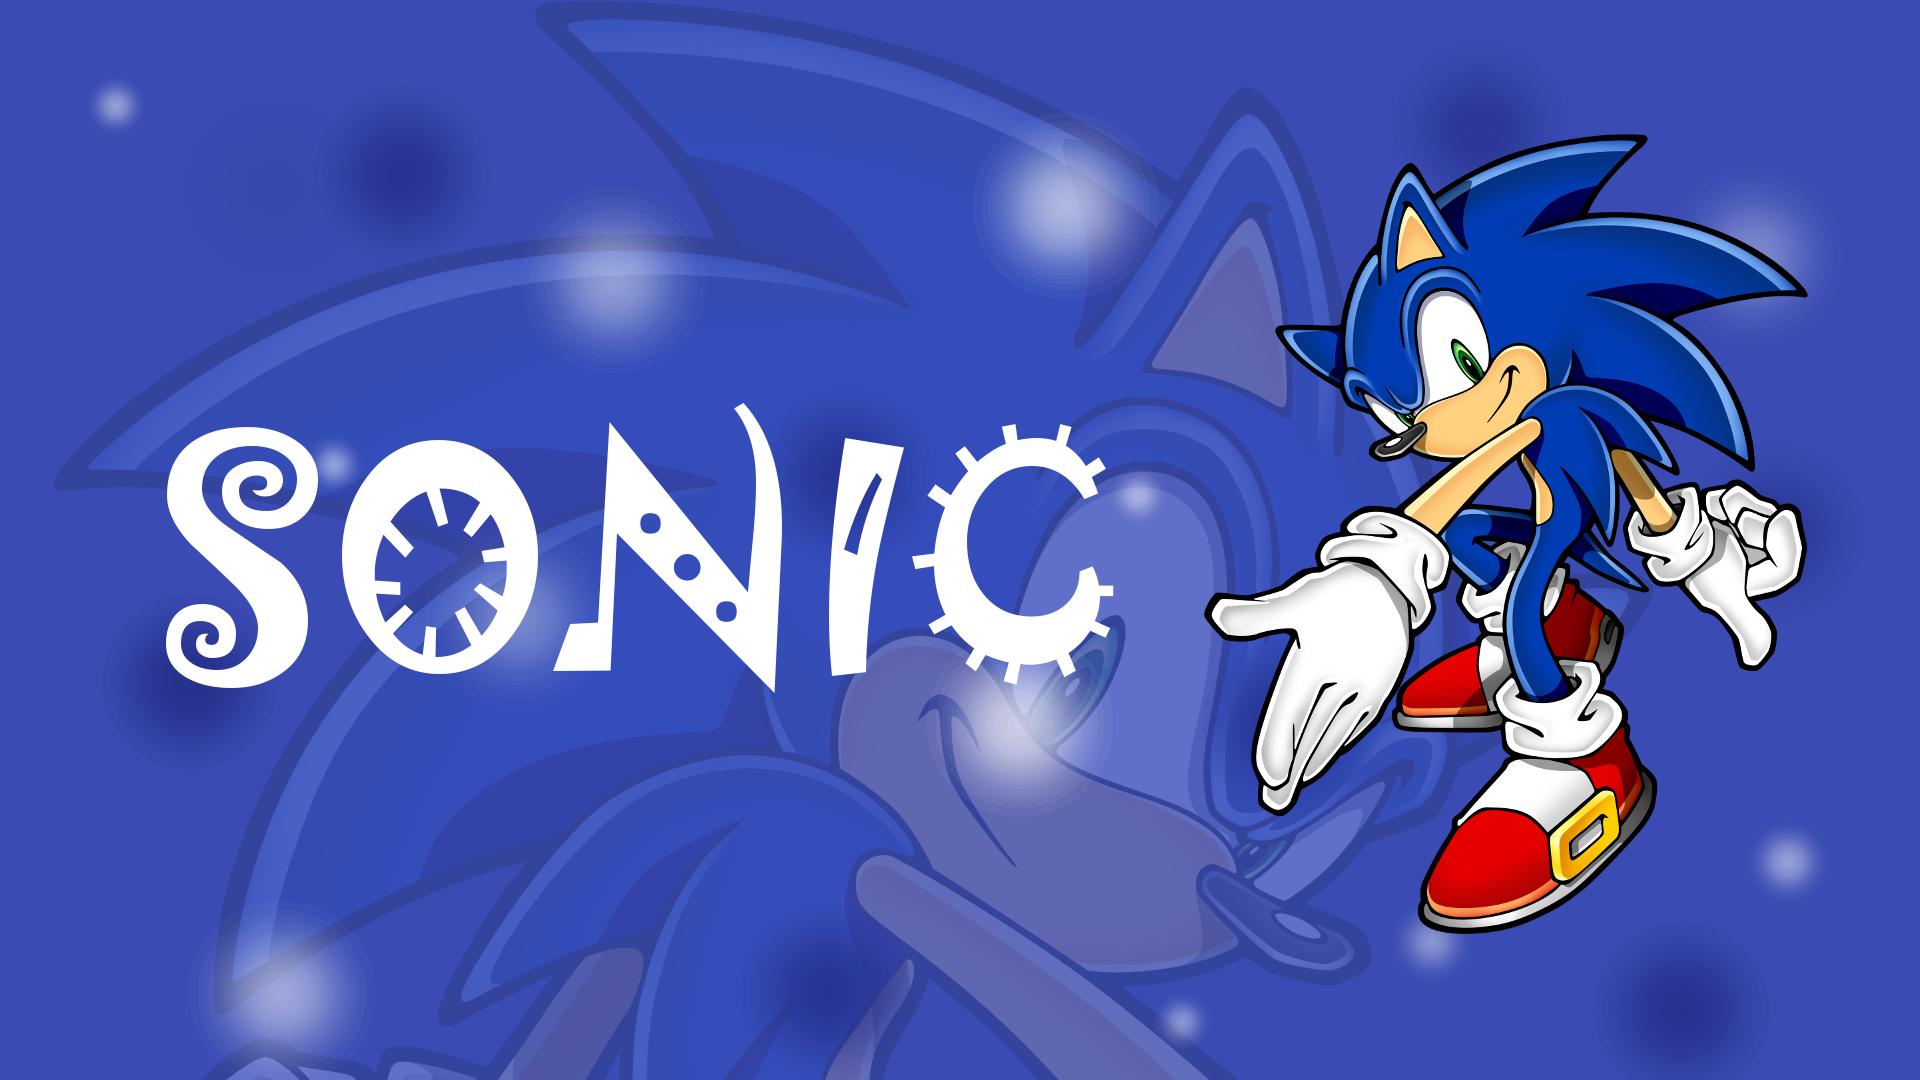 Johsouza Images Sonic The Hedgehog Wallpaper Hd Wallpaper And